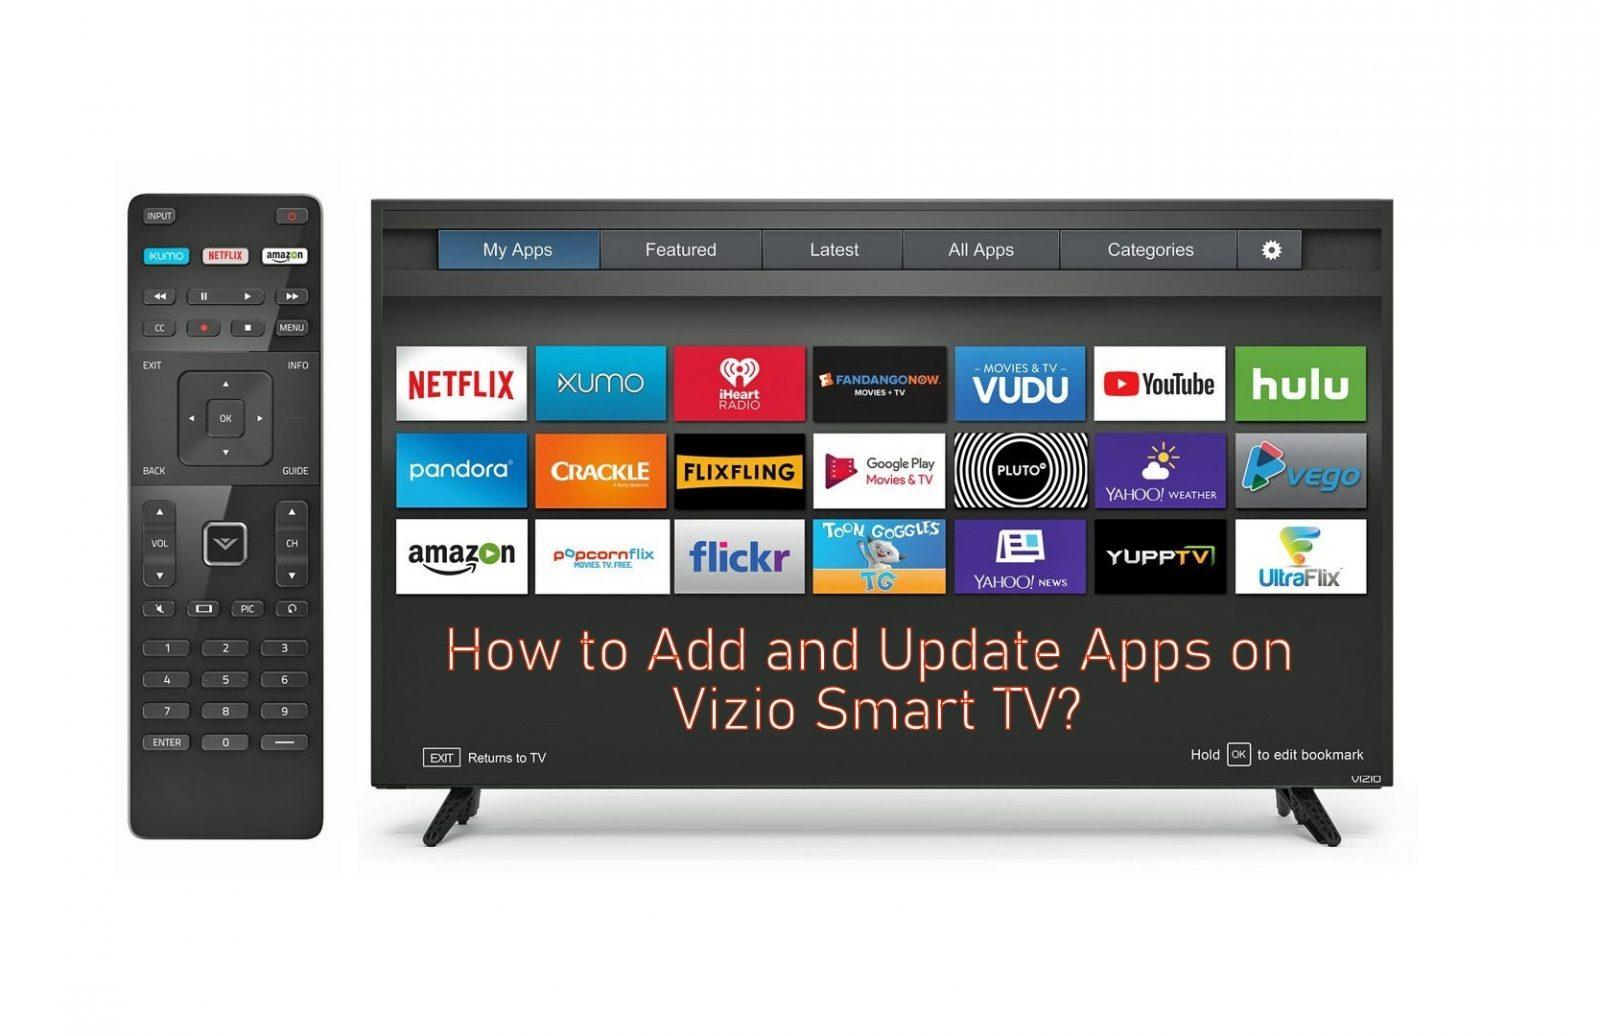 Update apps on Vizio Smart TV - How To Get Disney Plus On My Smart Tv Vizio